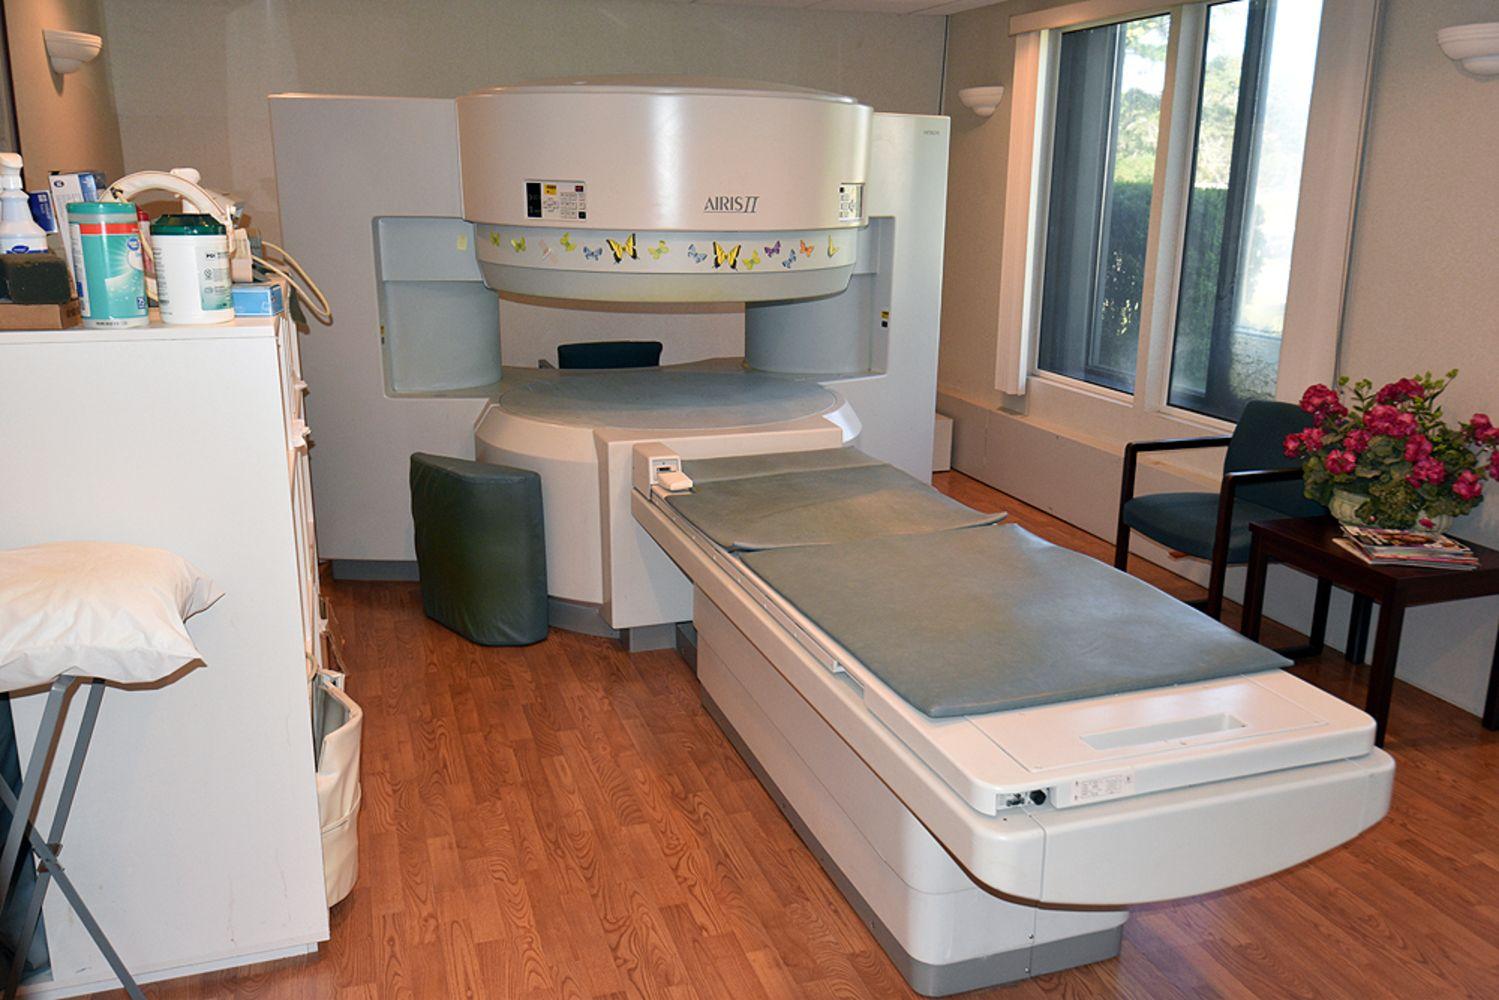 Bankruptcy Auction - Open MRI of Phillipsburg, NJ